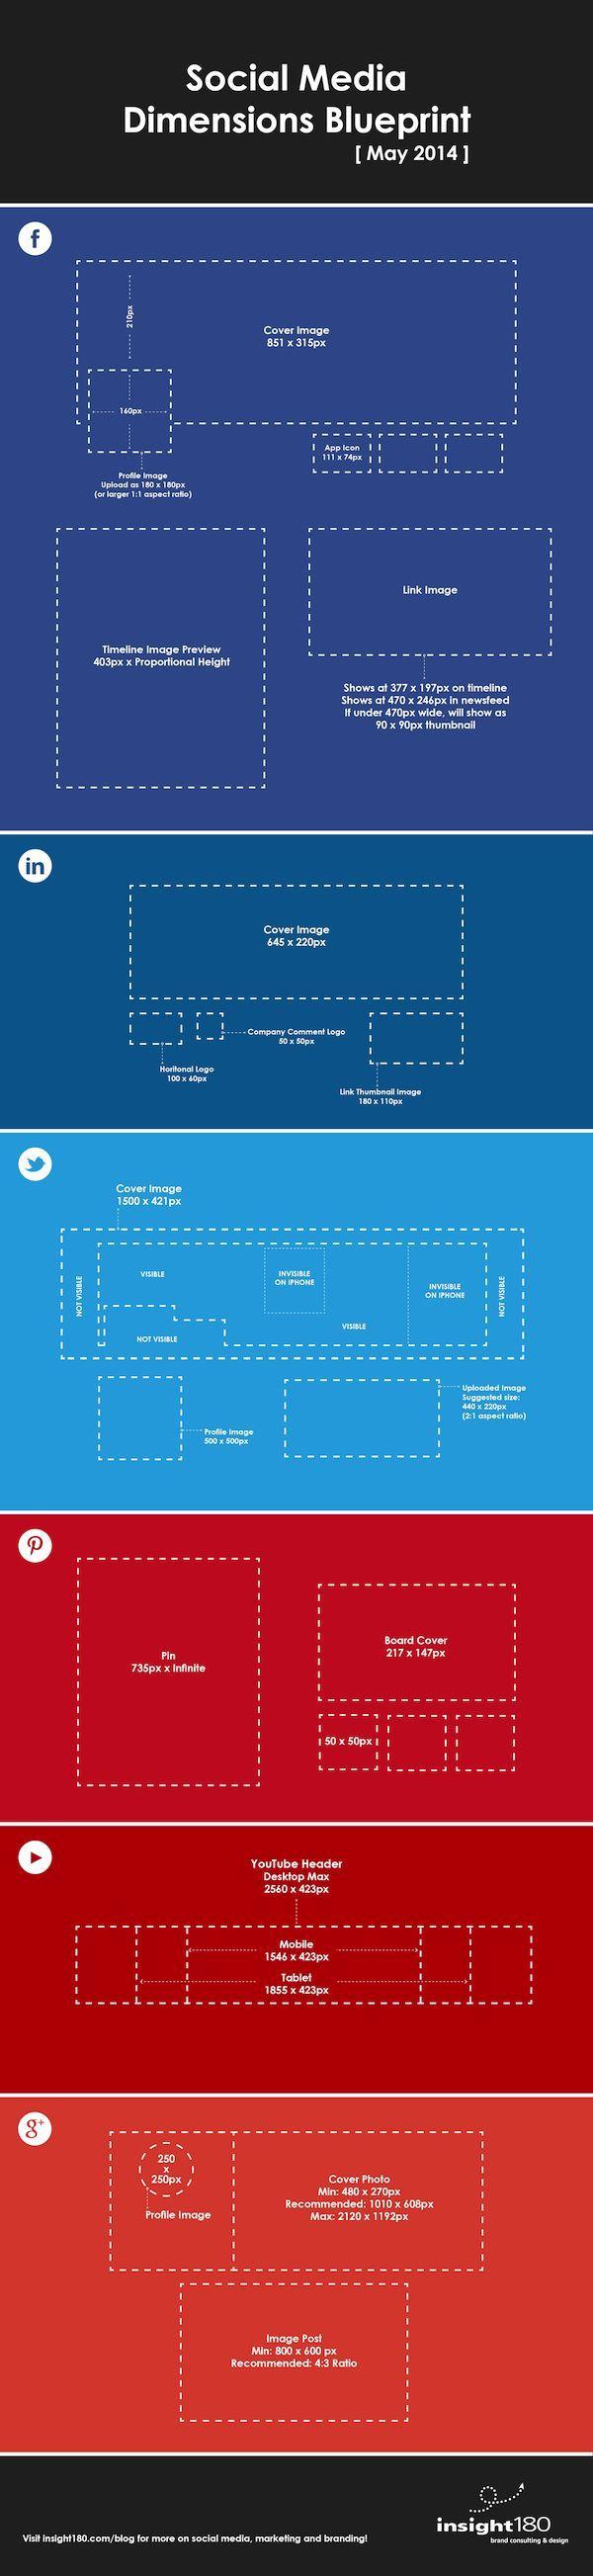 #INFOGRAPHIC Social Media Dimensions Blueprint | Social Media Today #socialmedia #smm